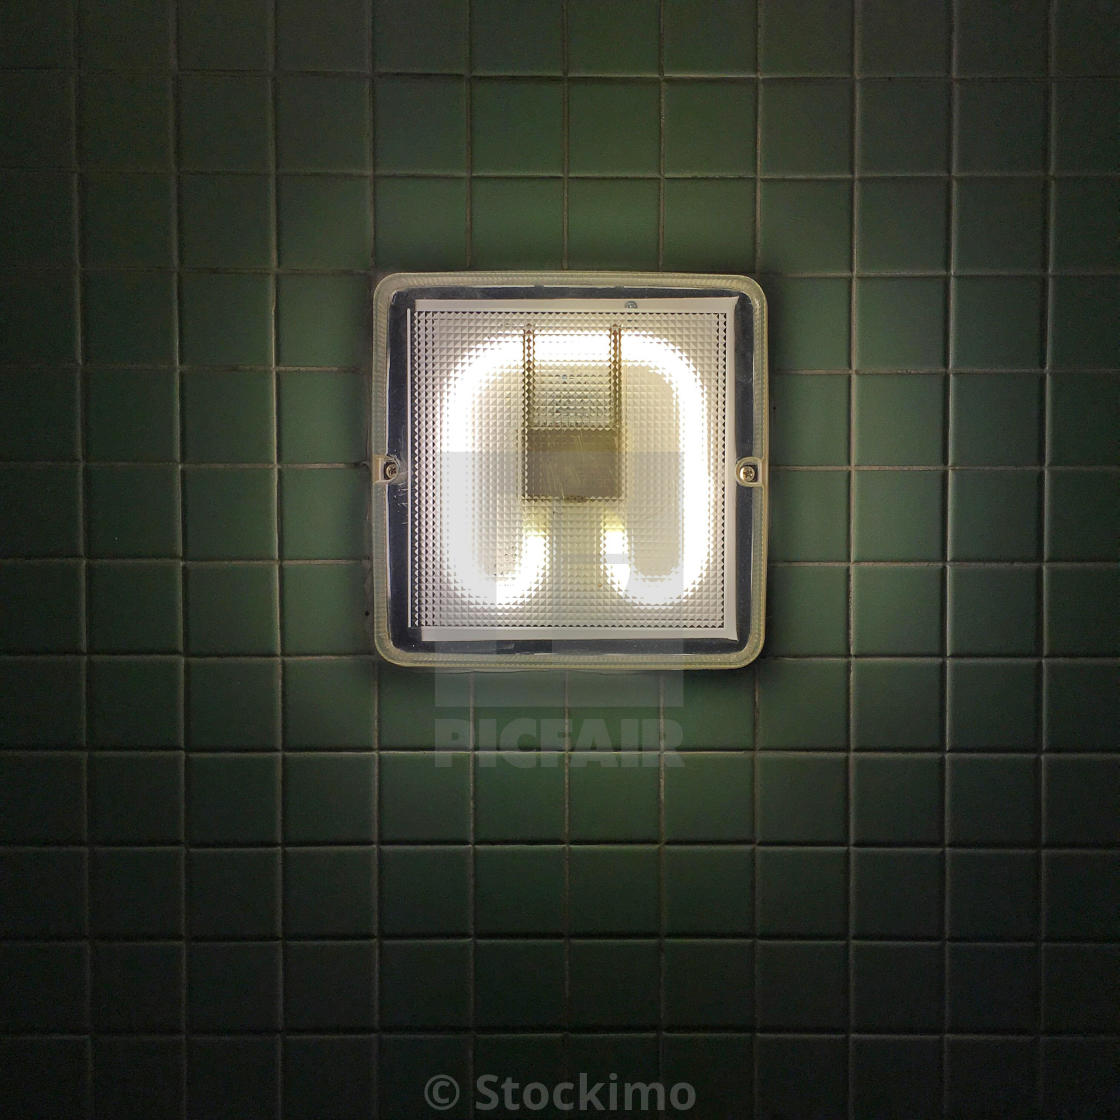 """Light in Bathroom against white tile. Influenced by William Eggleston"" stock image"